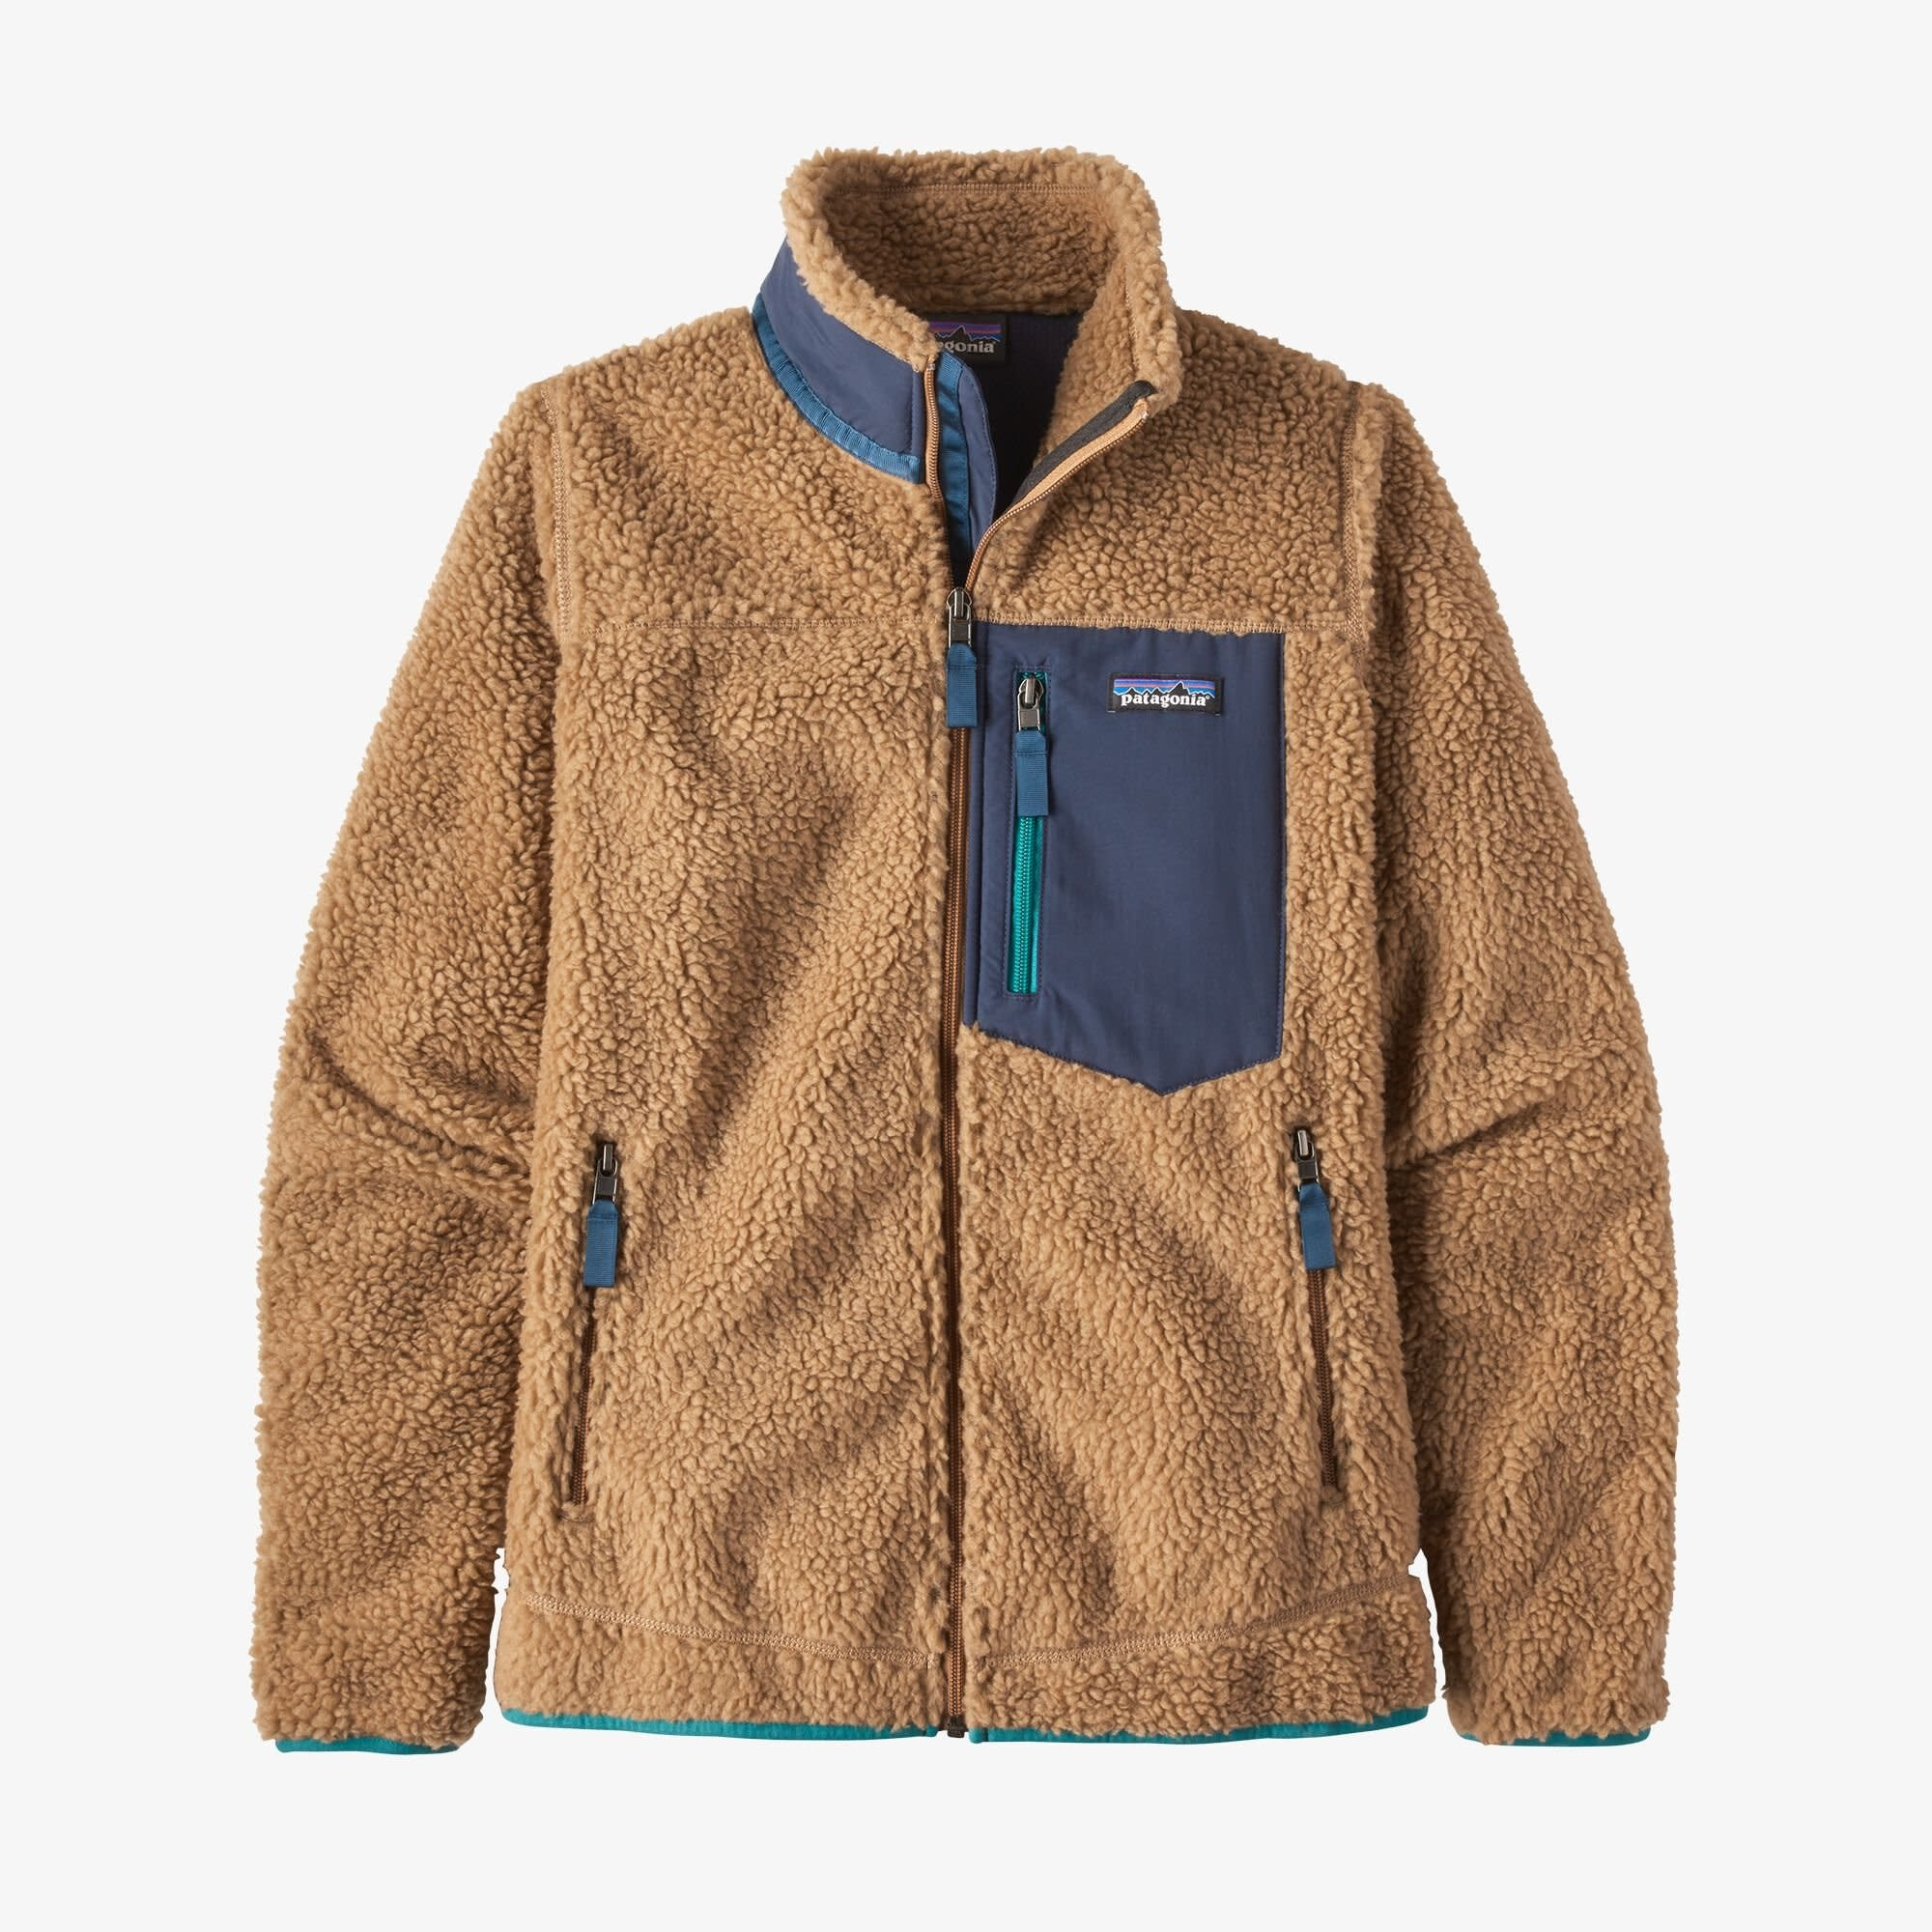 Patagonia Patagonia W's Classic Retro-X Jacket